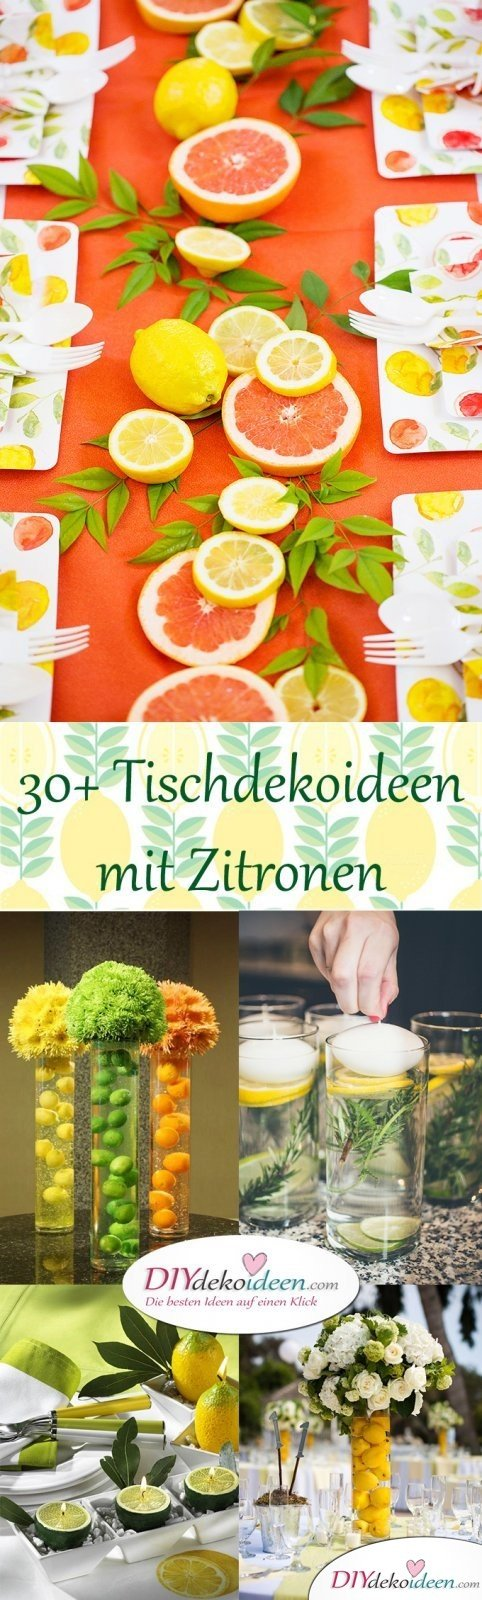 30+ Tischdeko Ideen mit Zitronen - Erfrischende DIY Dekoideen